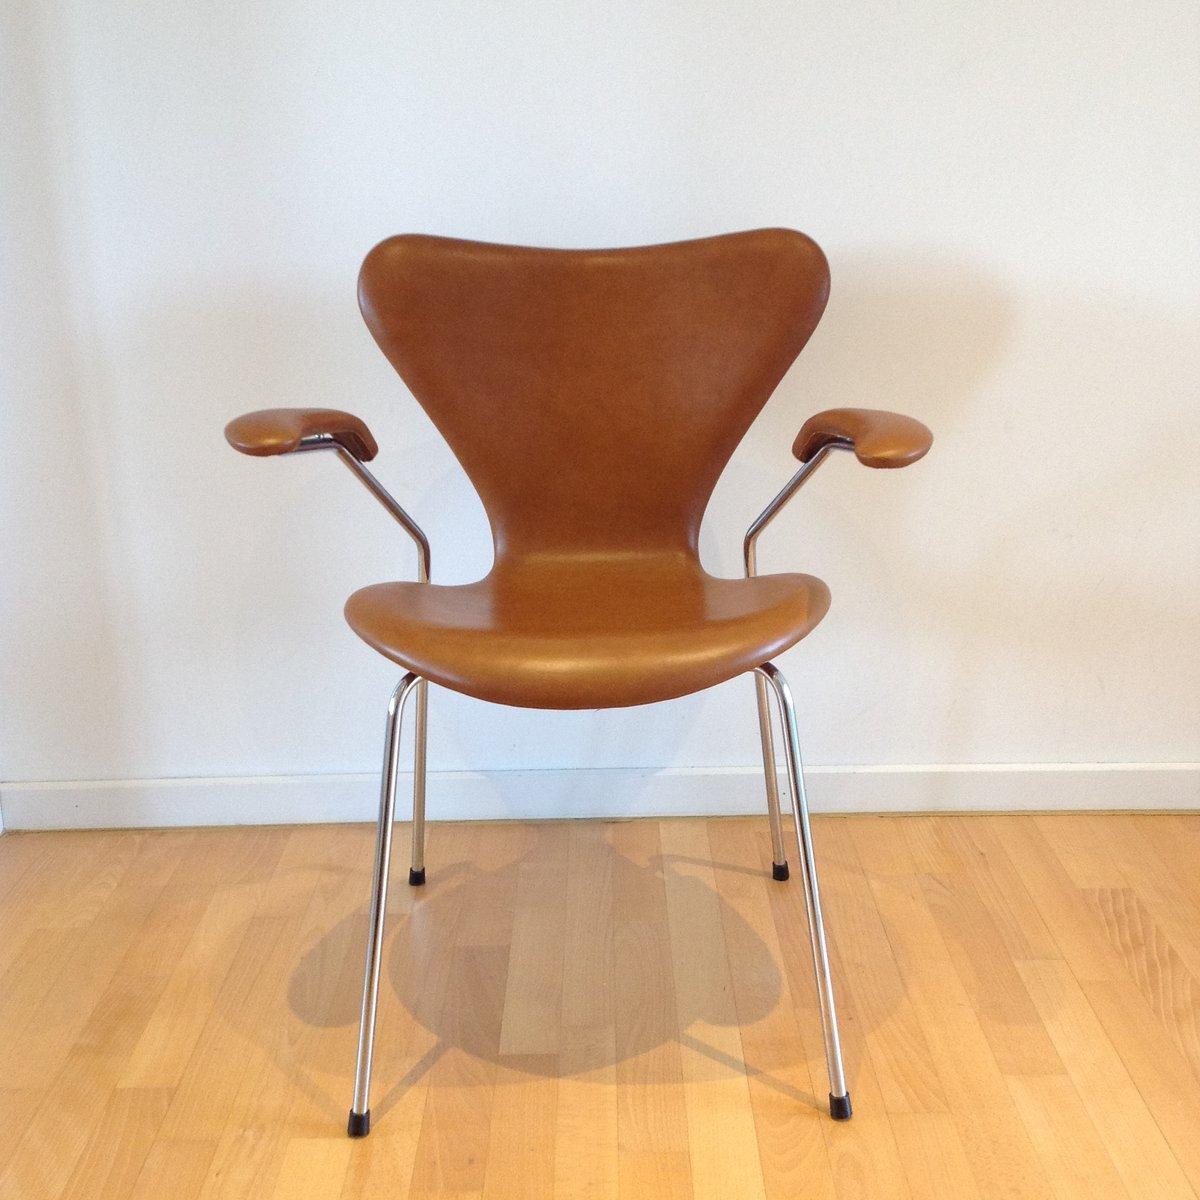 3207 Syveren Elegance Wax Dining Chair In Brown By Arne Jacobsen For Fritz Hansen